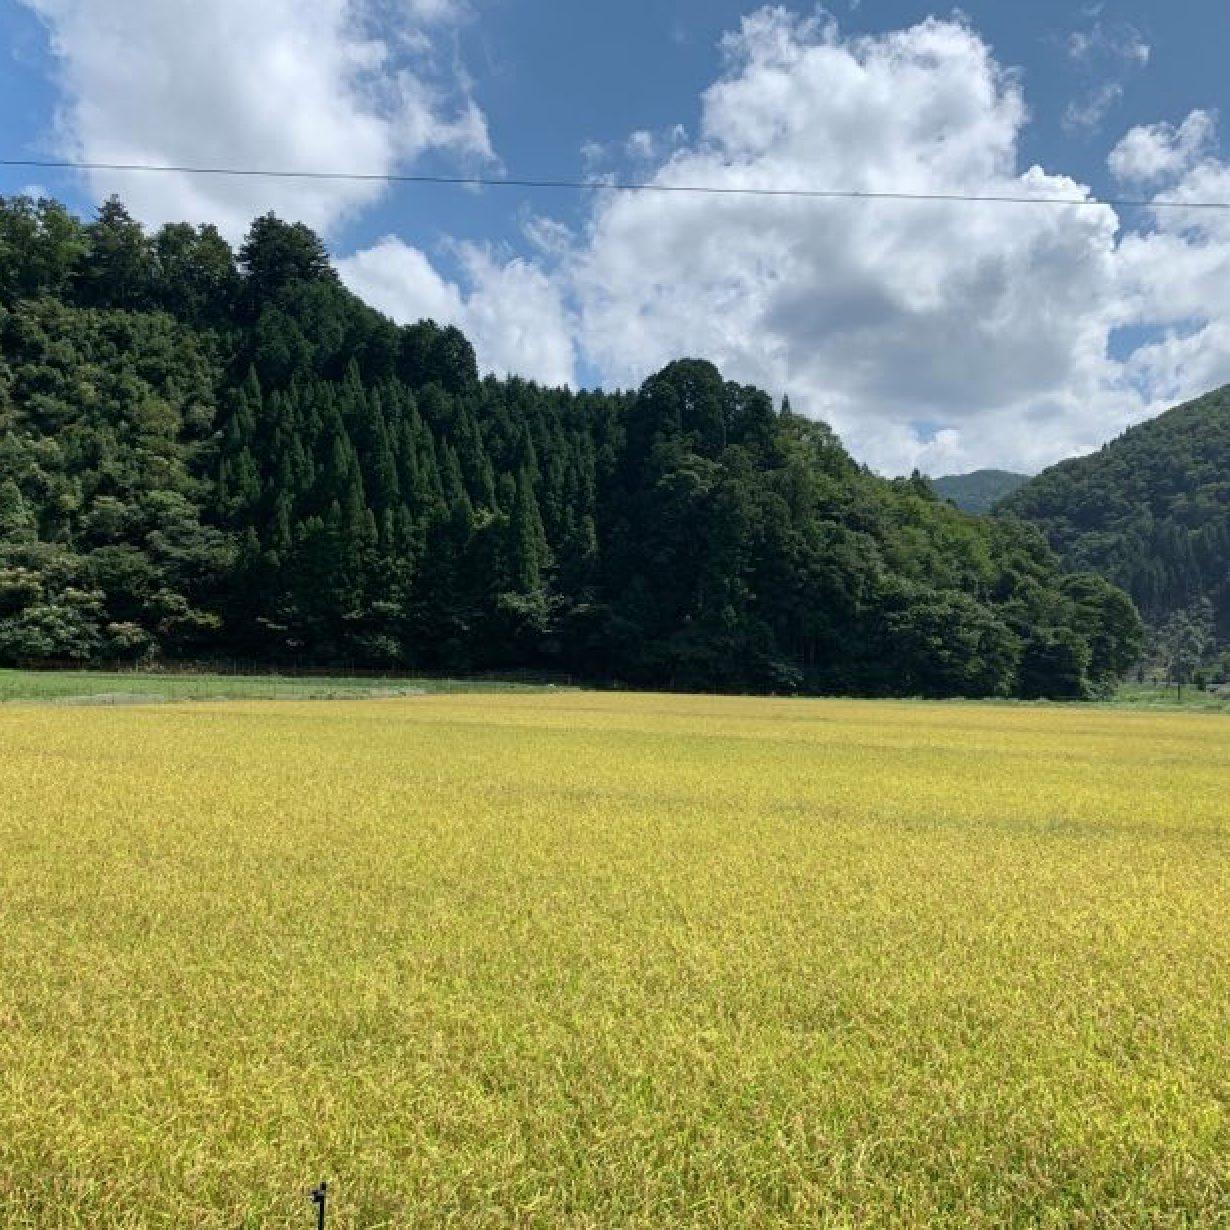 mumokuteki farmでは稲刈りが始まりました!